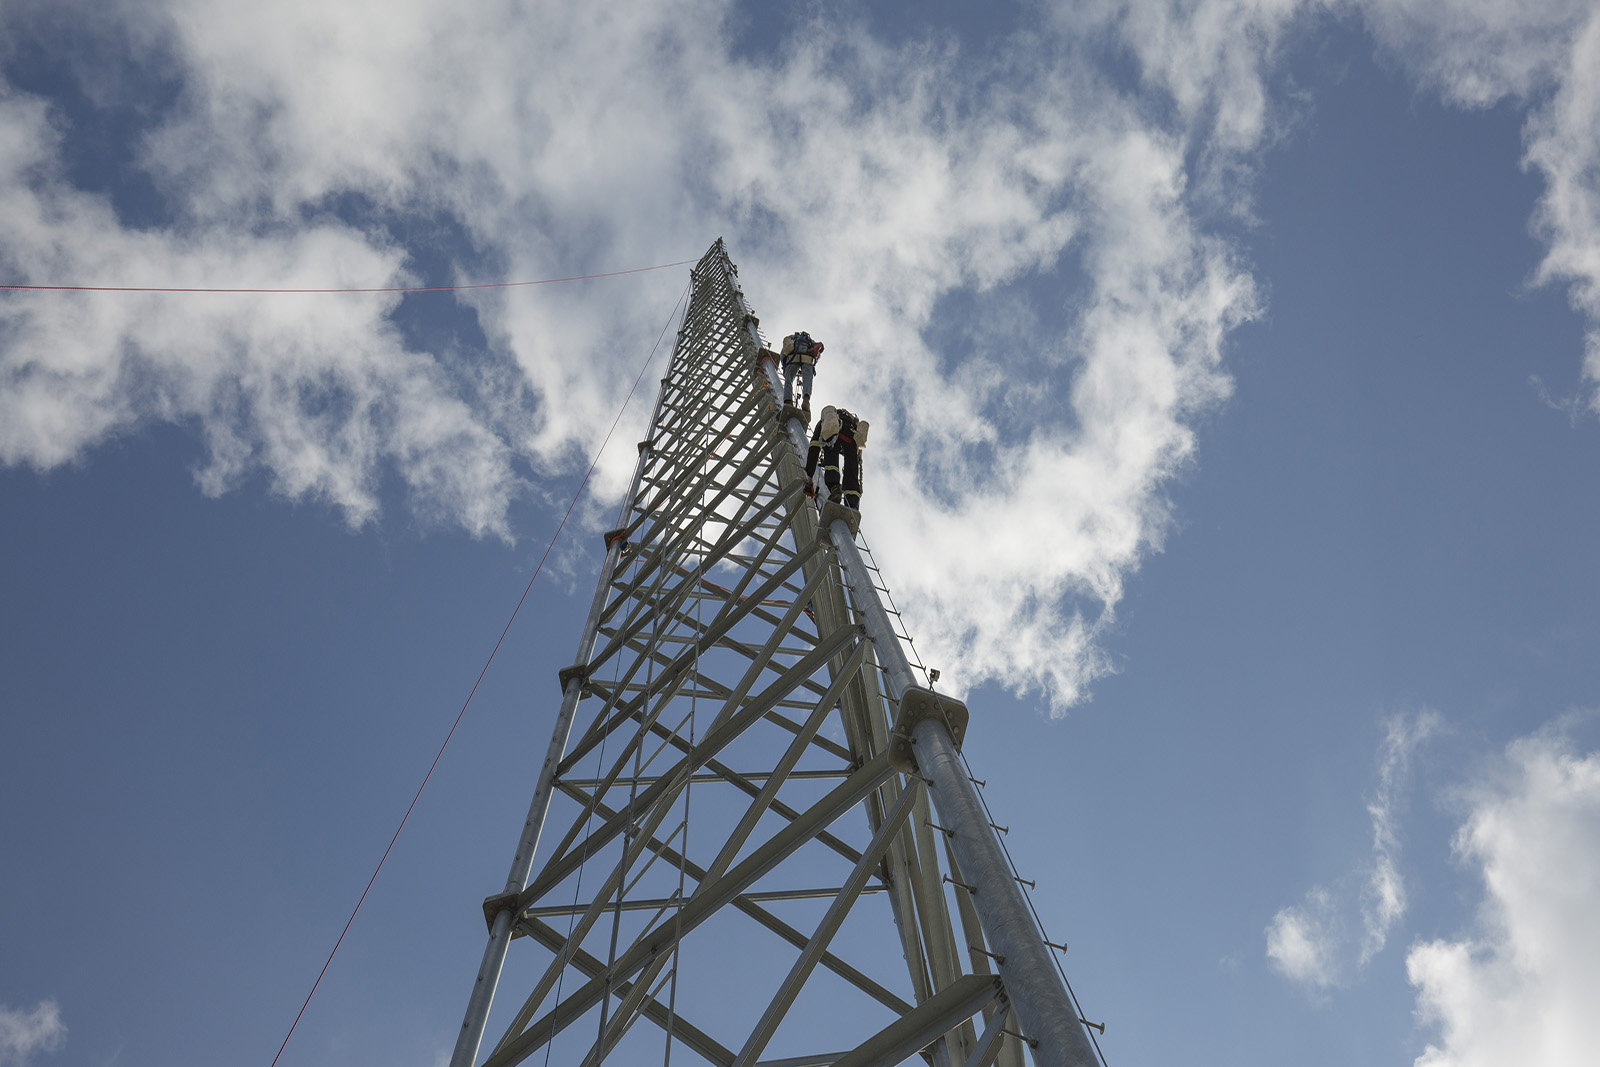 Towers - Display Photo